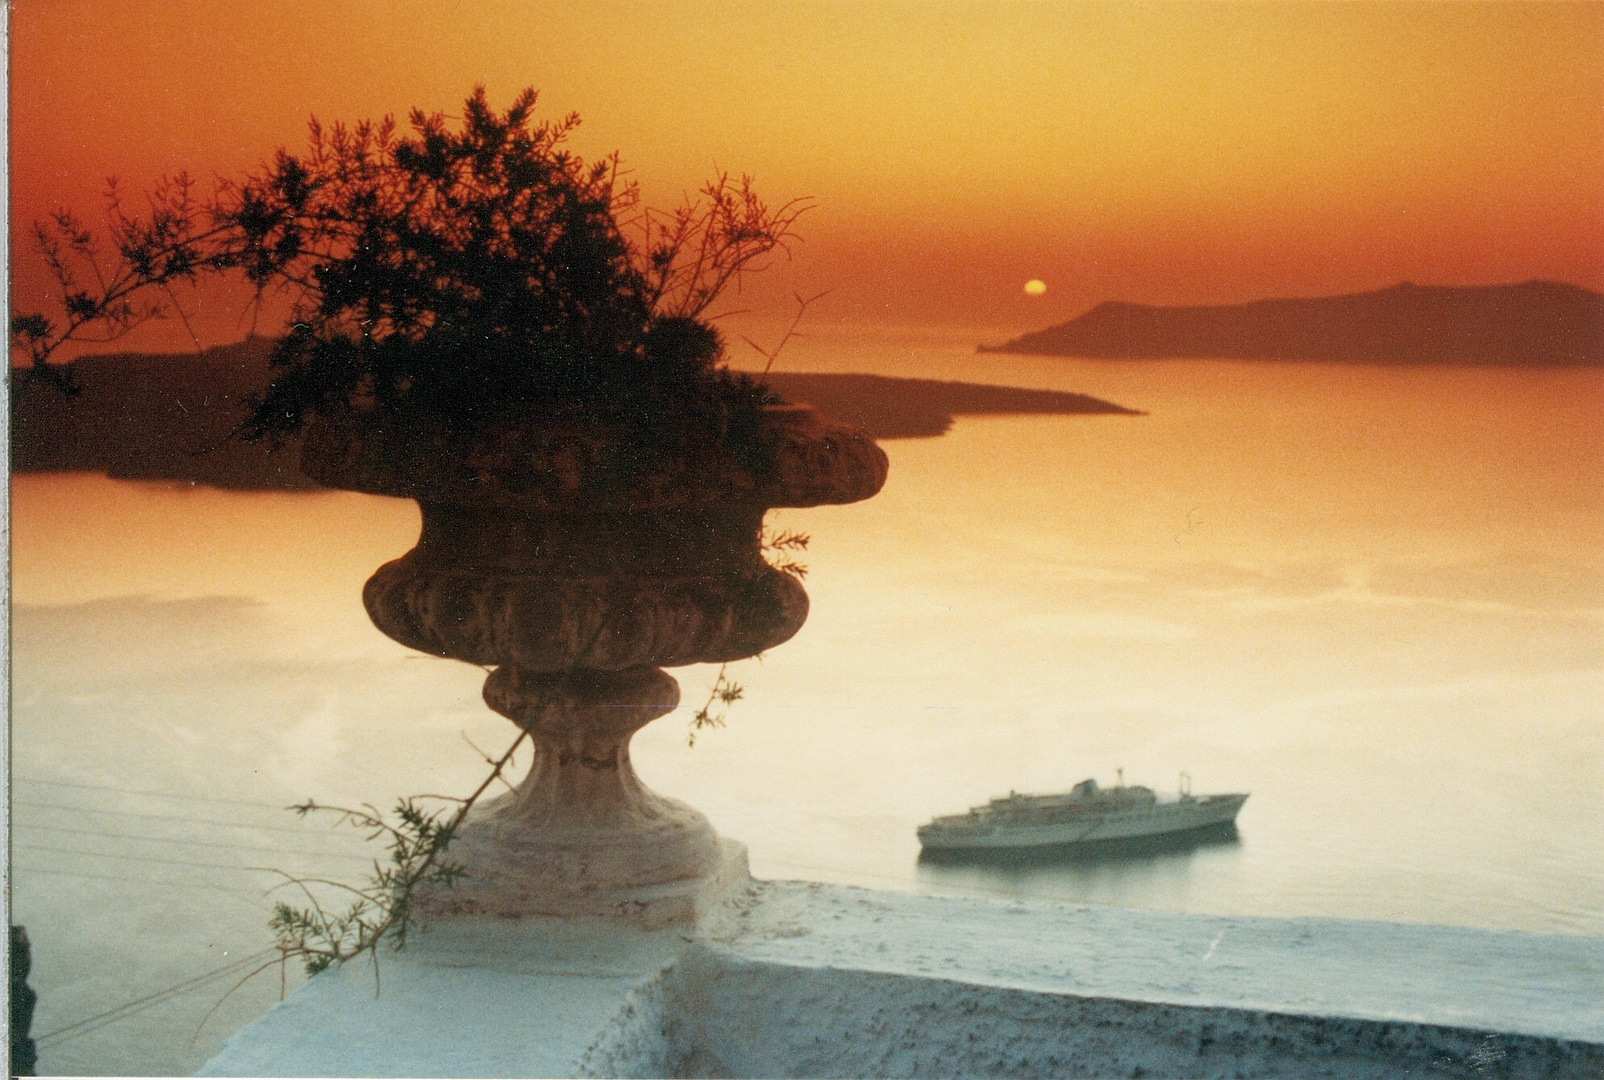 Sunsetdrama with cruiser